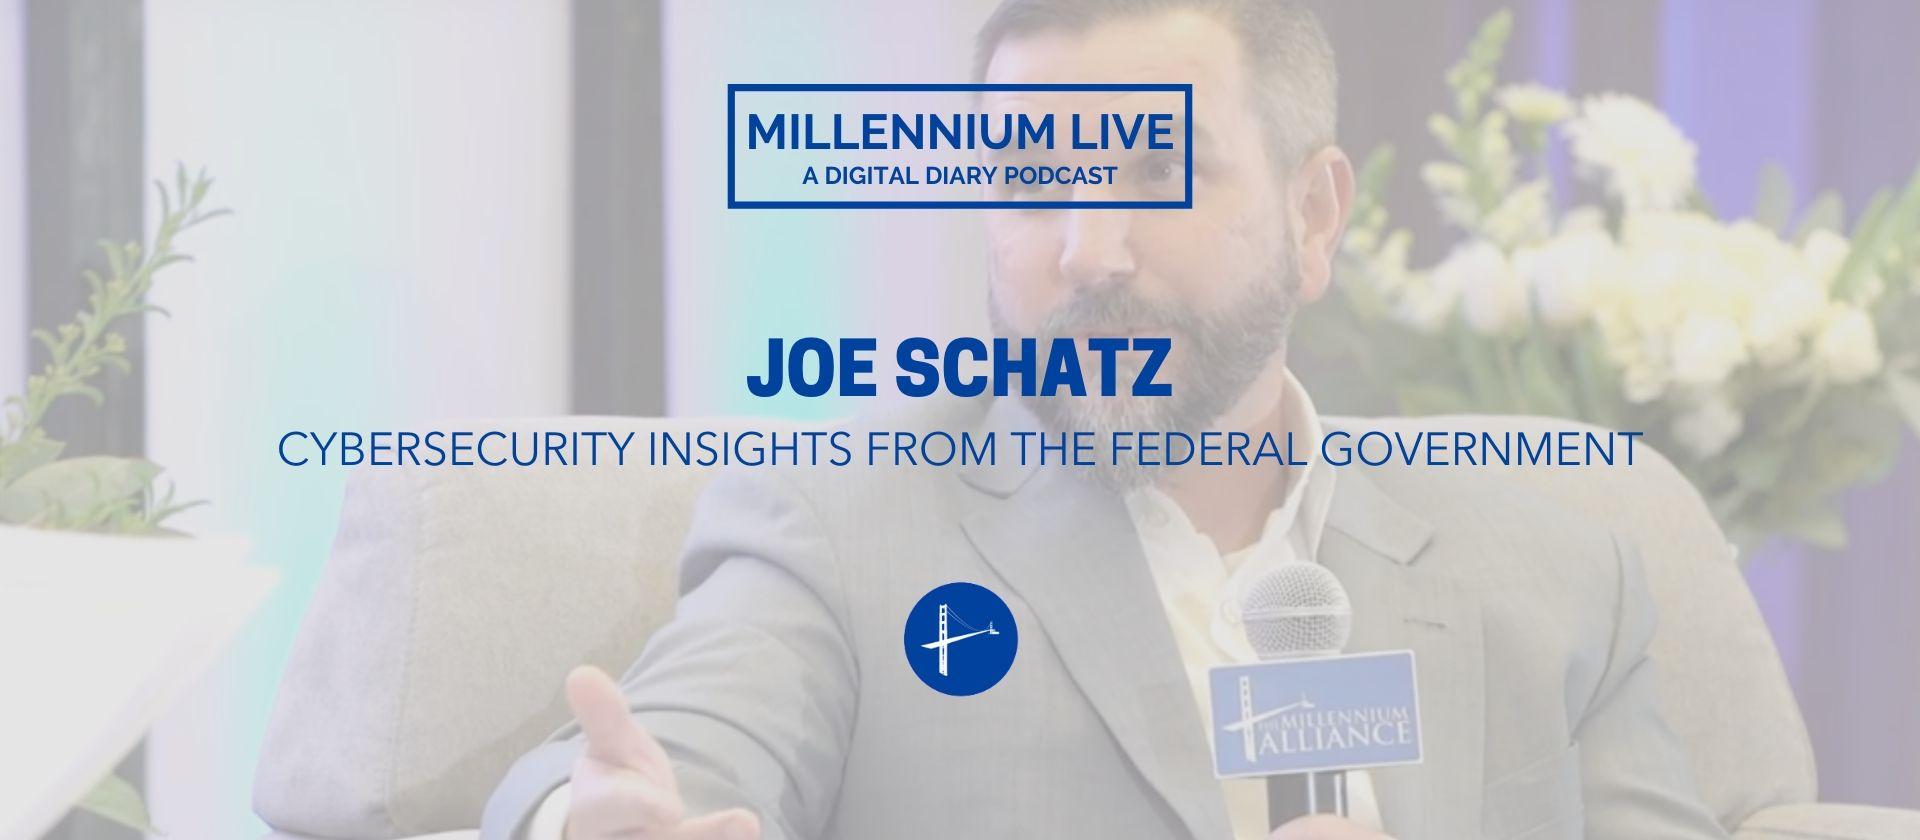 Joe Schatz White House CISO Millennium Alliance Podcast